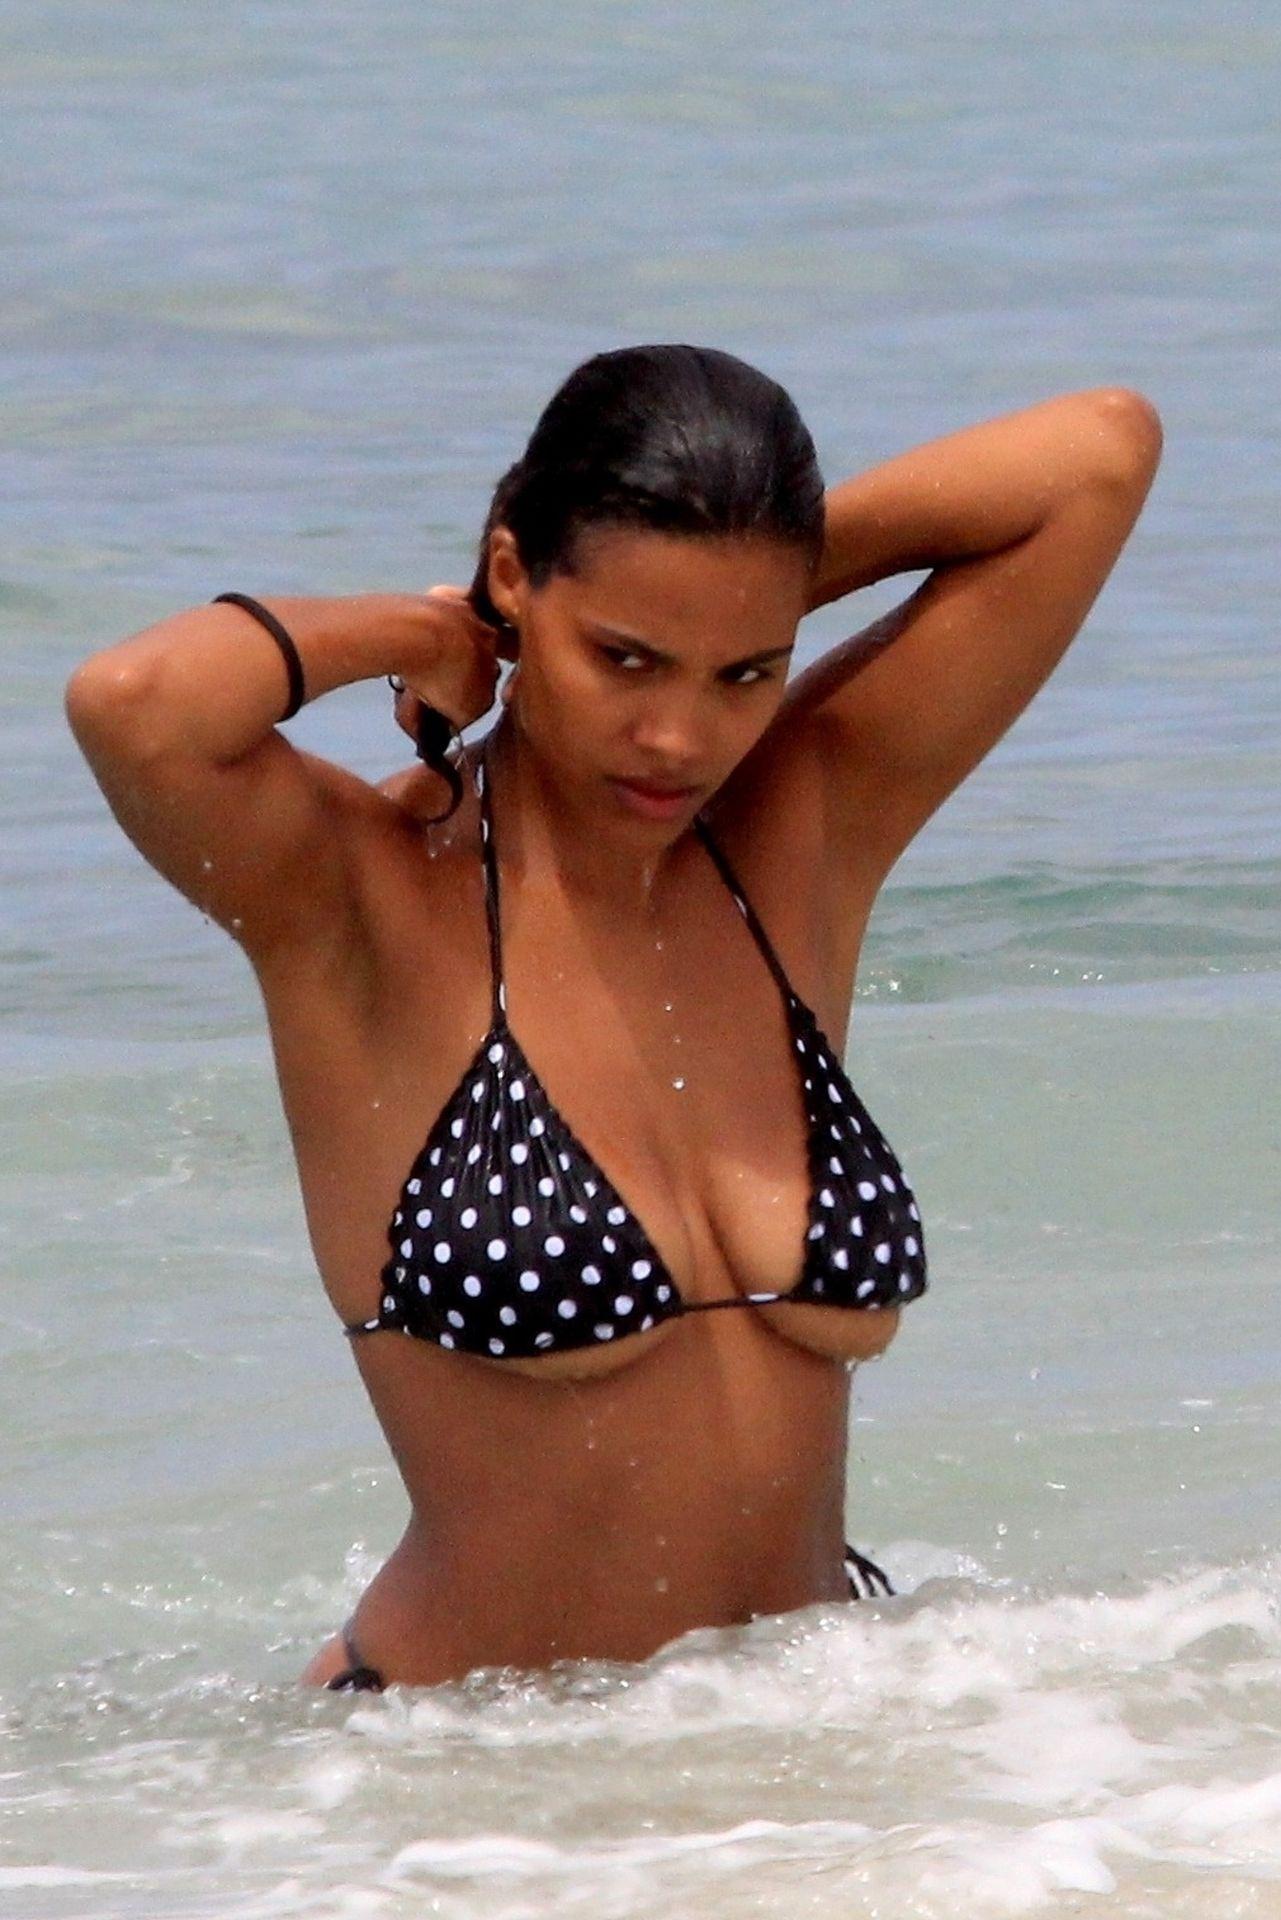 Tina Kunakey Nearly Nip Slip While Frolicking On The Beach In Rio 0002